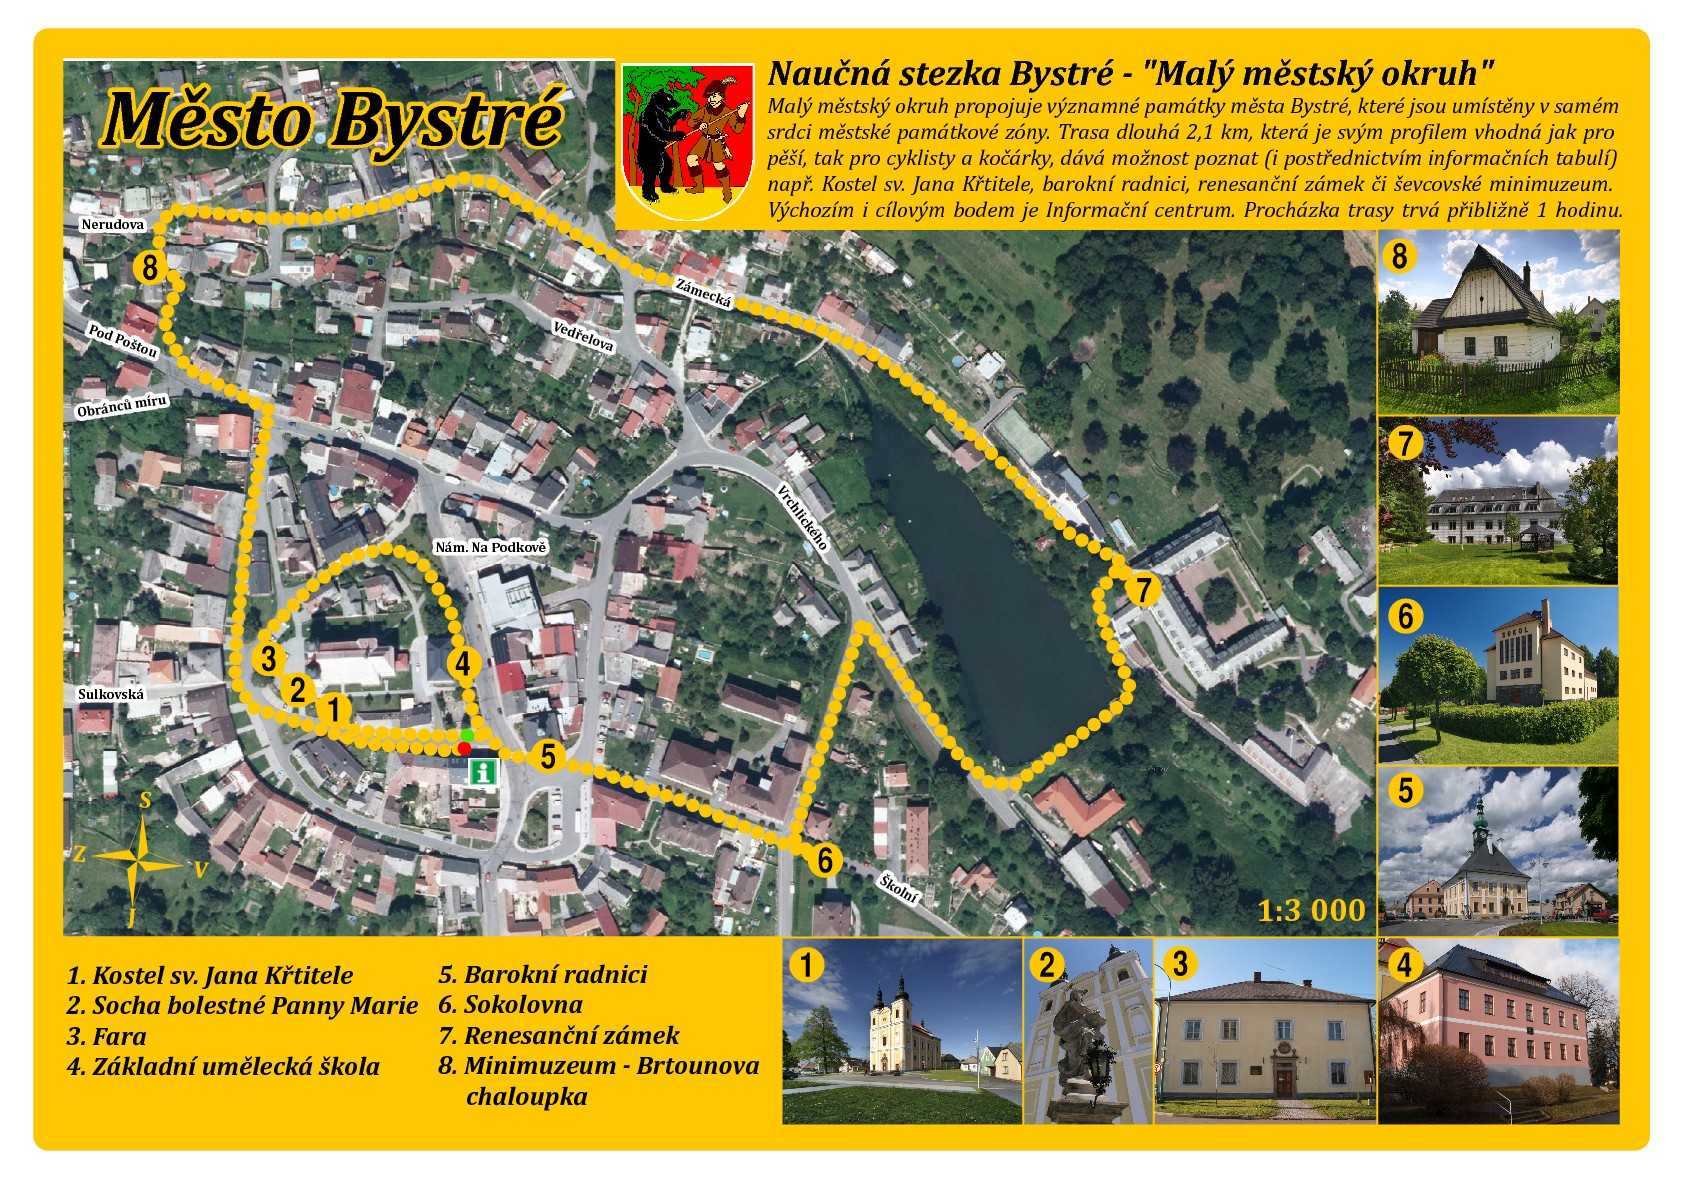 http://www.bystre.cz/images/mal_okruh-001-001.jpg